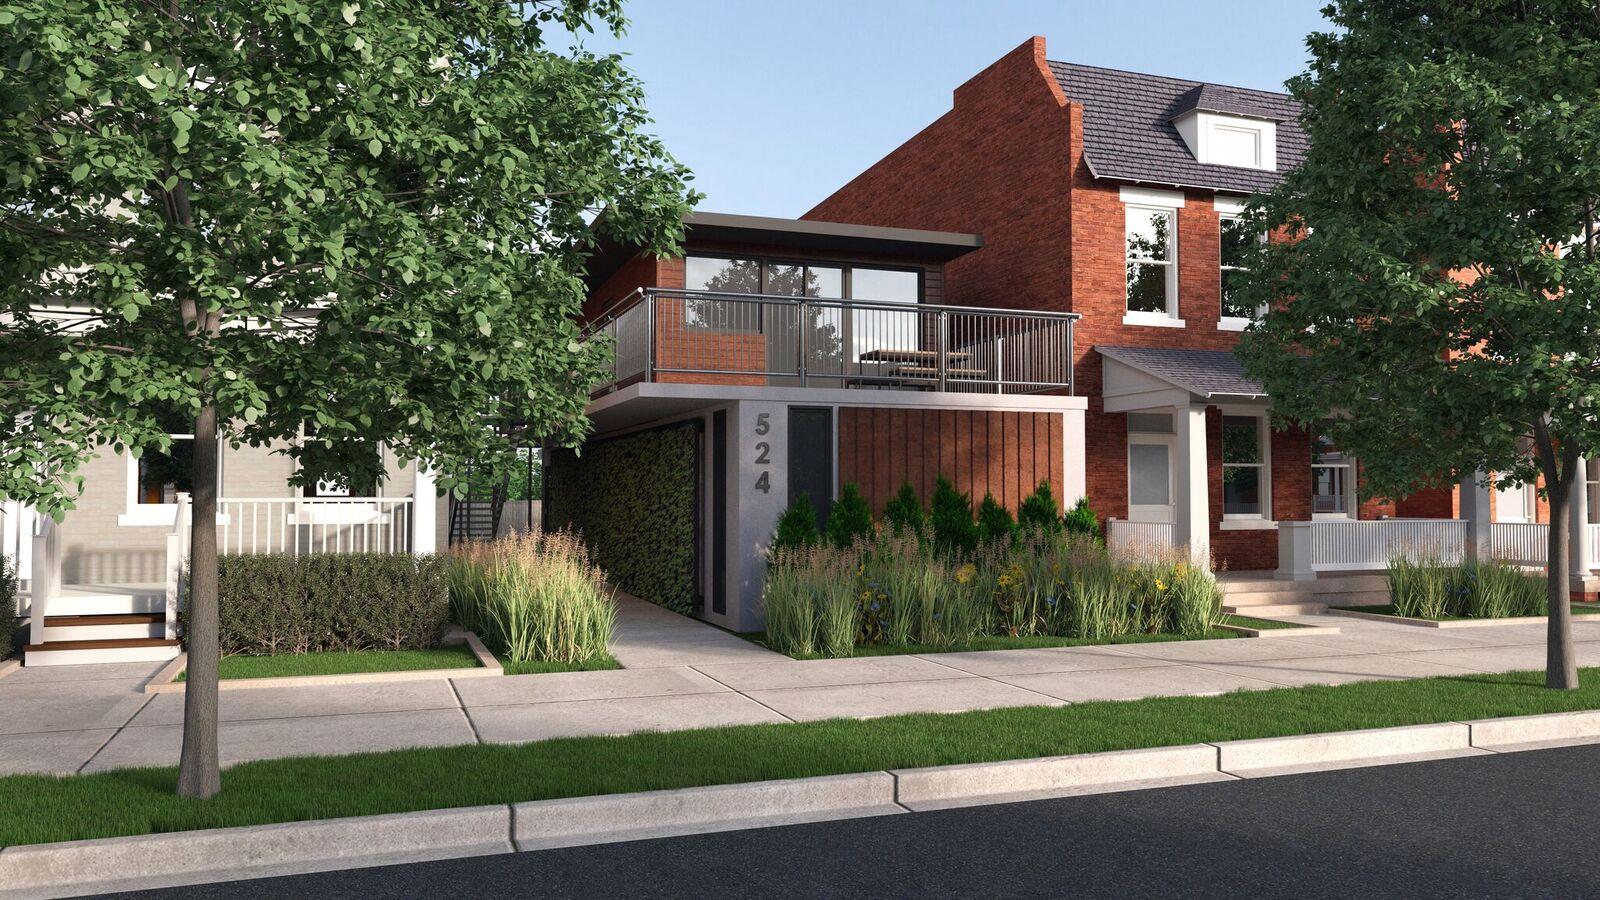 haven-modern-design-prefab-modular-airbnb-dwell-investment-real-estate.jpeg